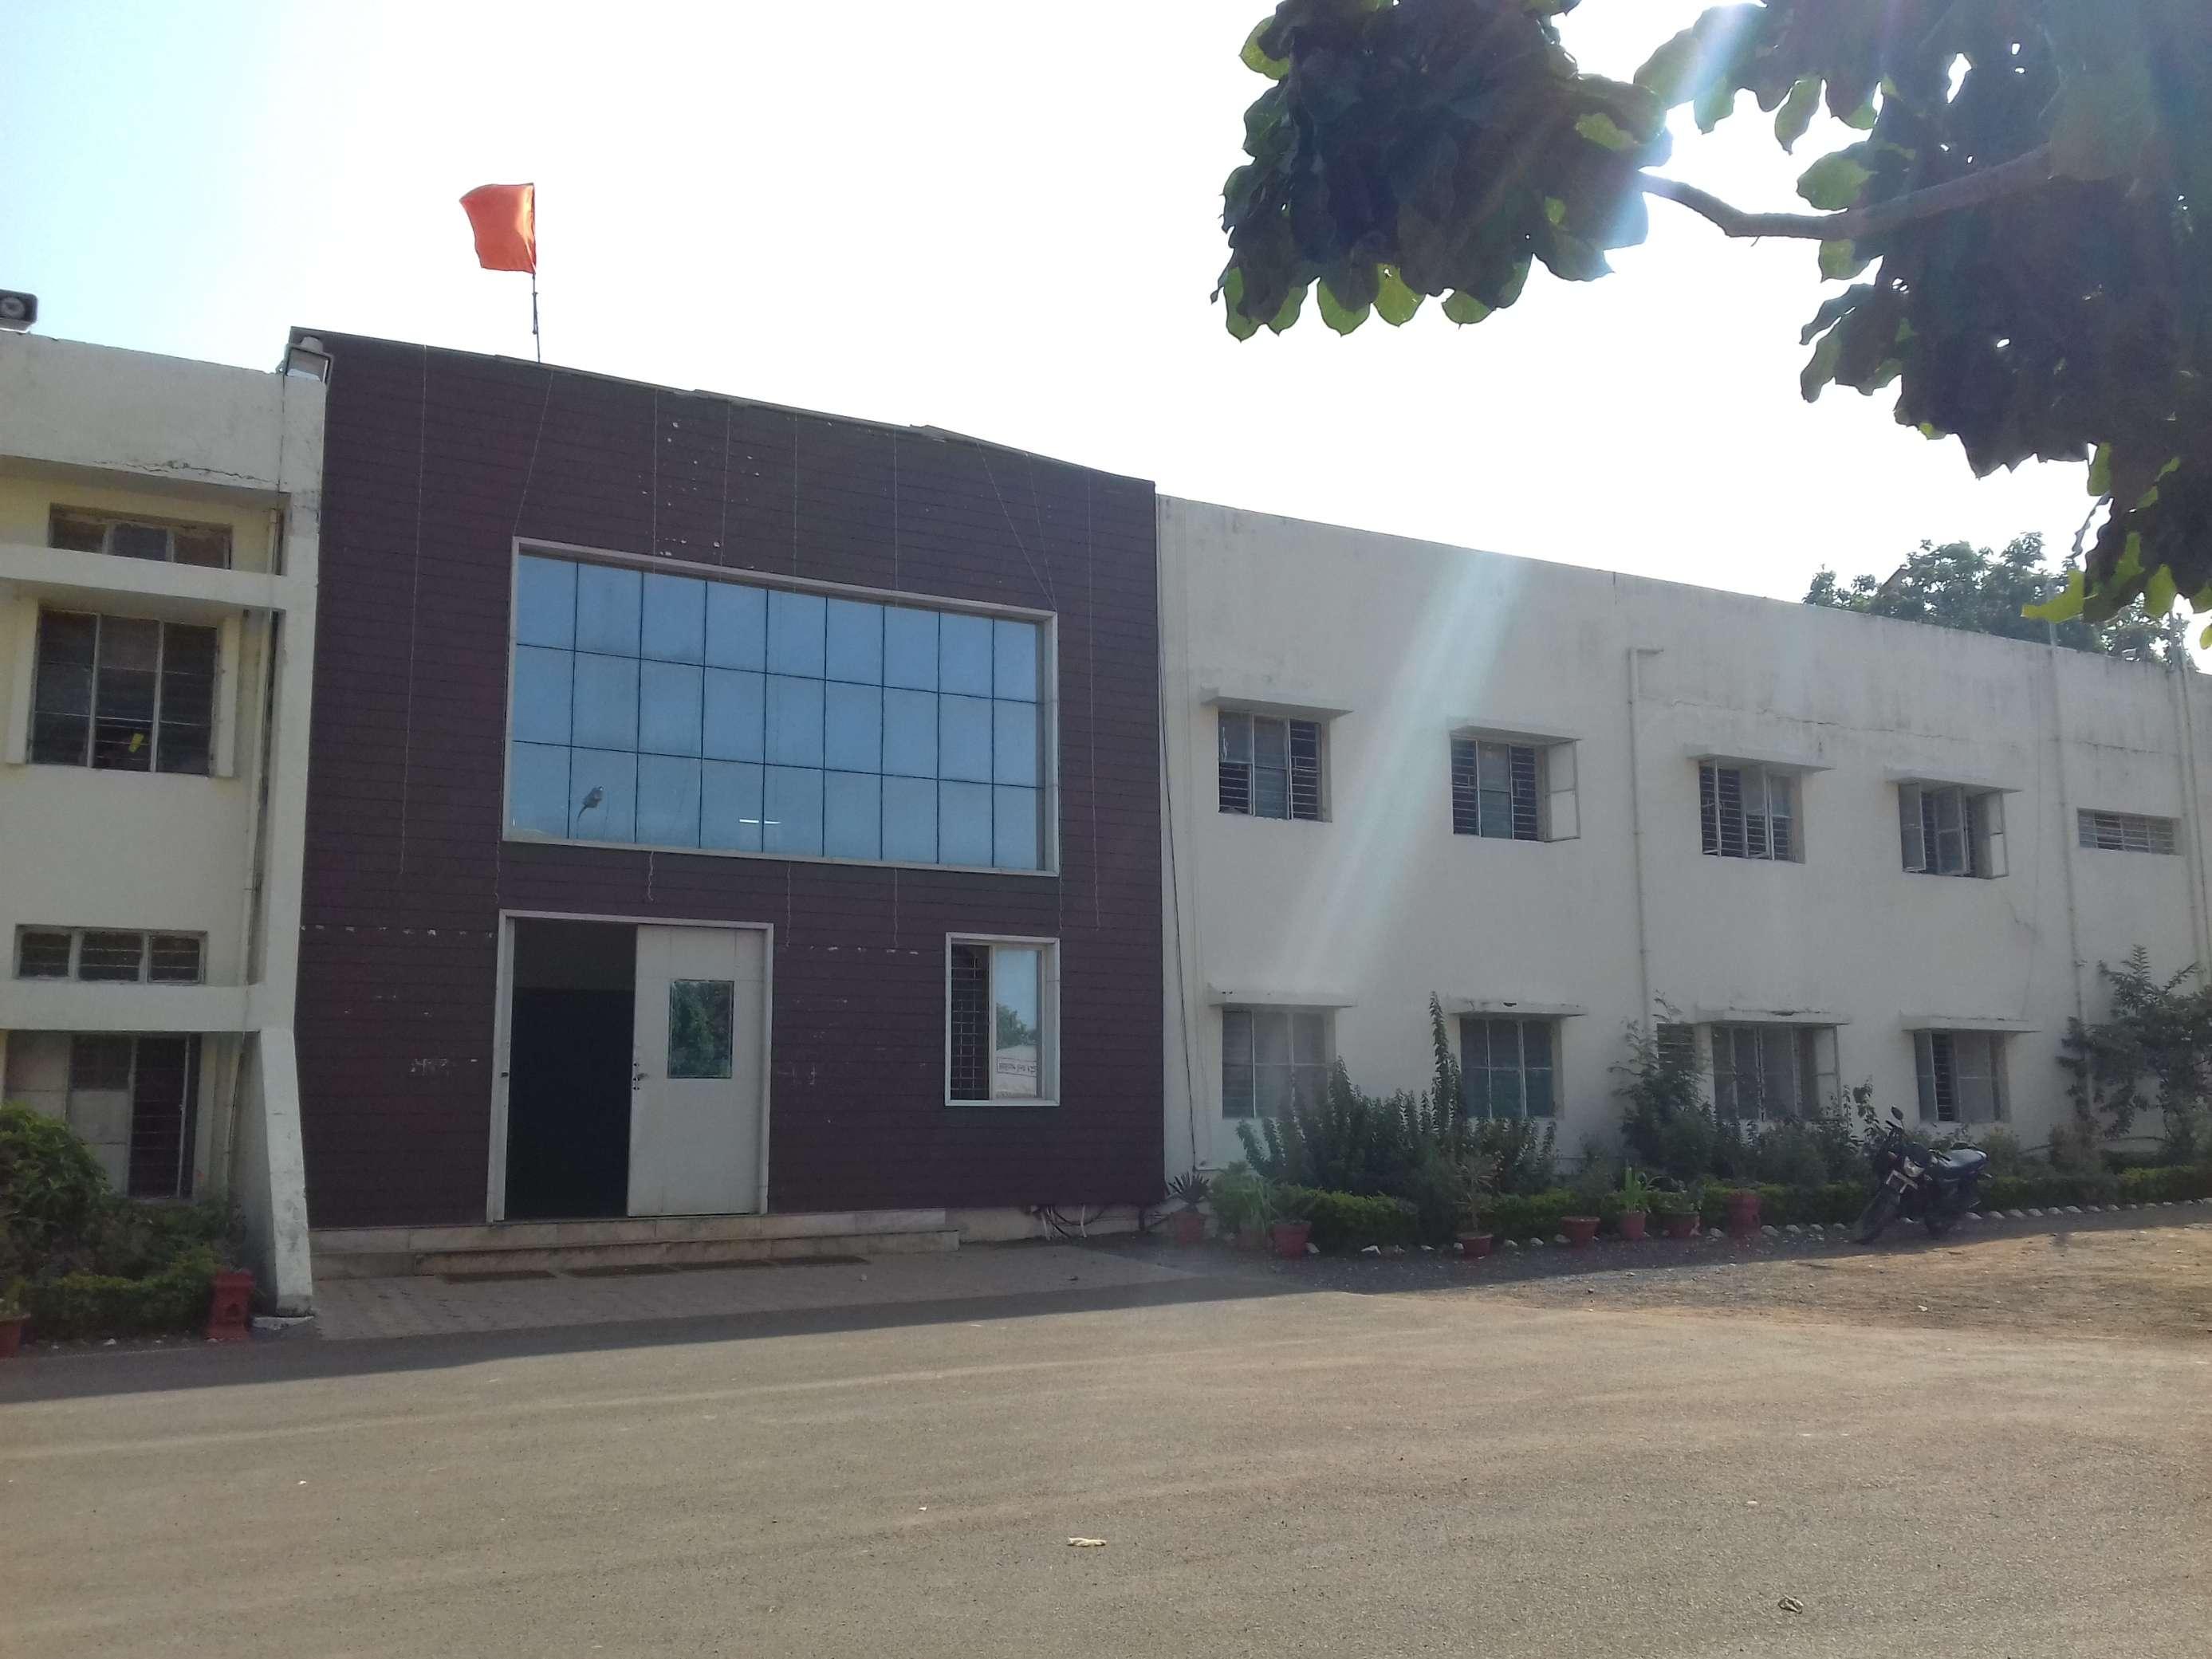 SARASWATI VIDYA MANDIR H S  RESIDENTIAL SCHOOL,, BHOPAL, MADHYA